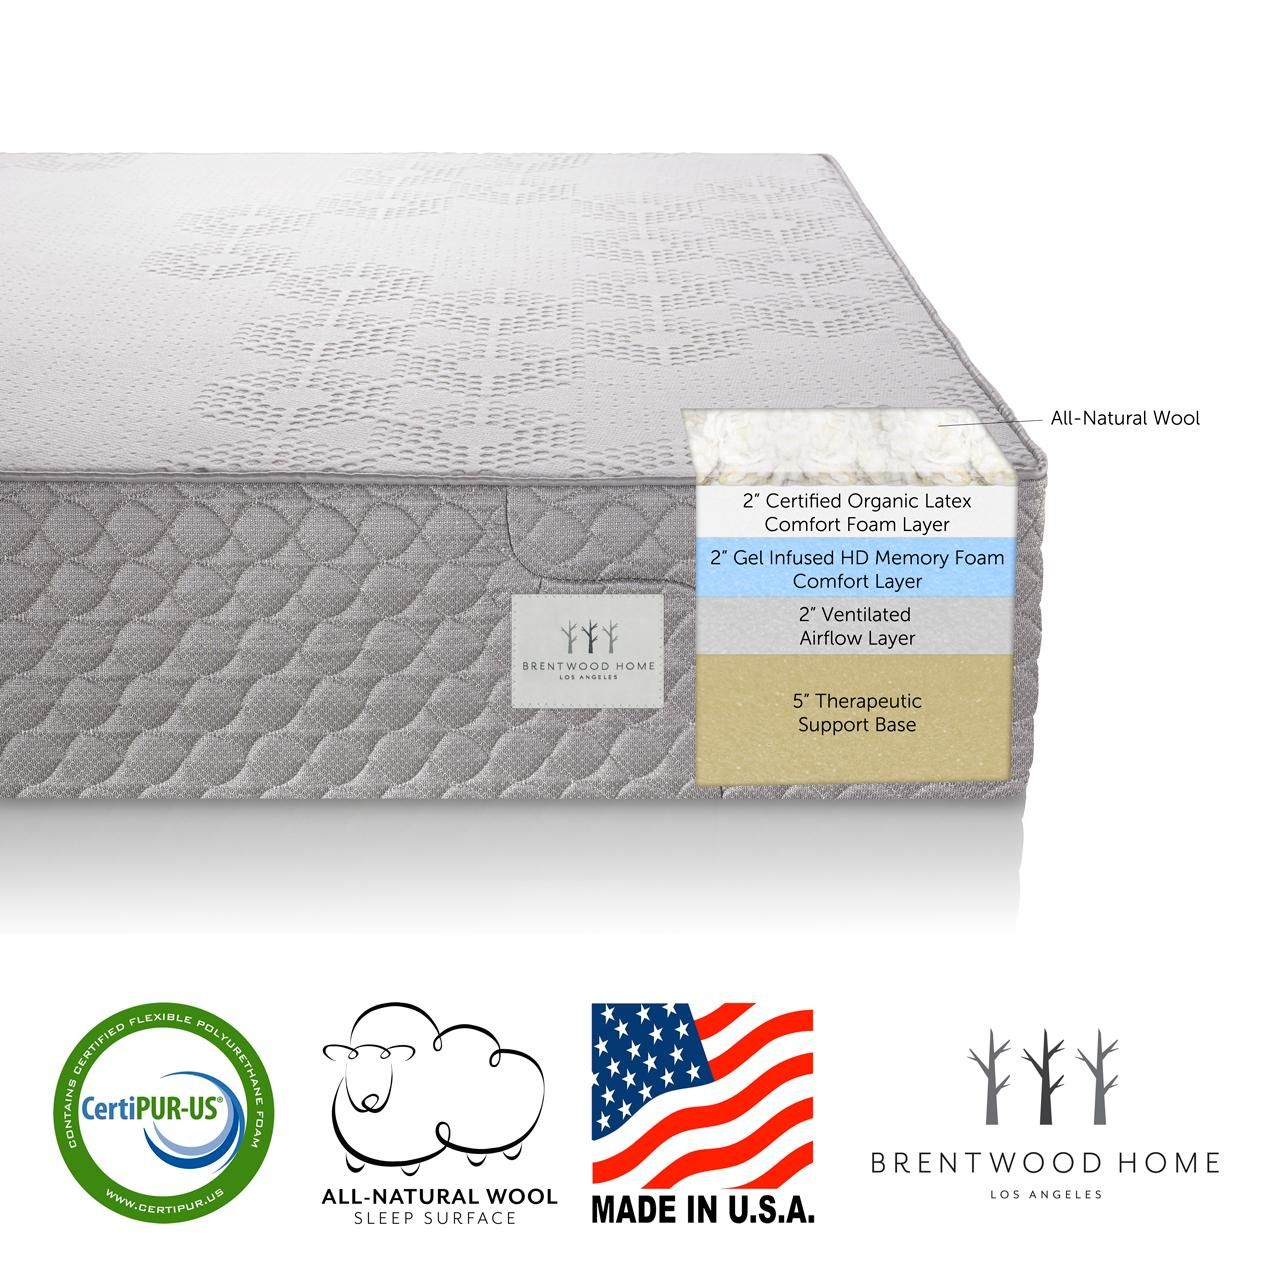 Amazon Com Brentwood Home 13 Inch Gel Hd Memory Foam Mattress Made In Usa Certipur Us 25 Yea Memory Foam Mattress Gel Memory Foam Mattress Gel Memory Foam